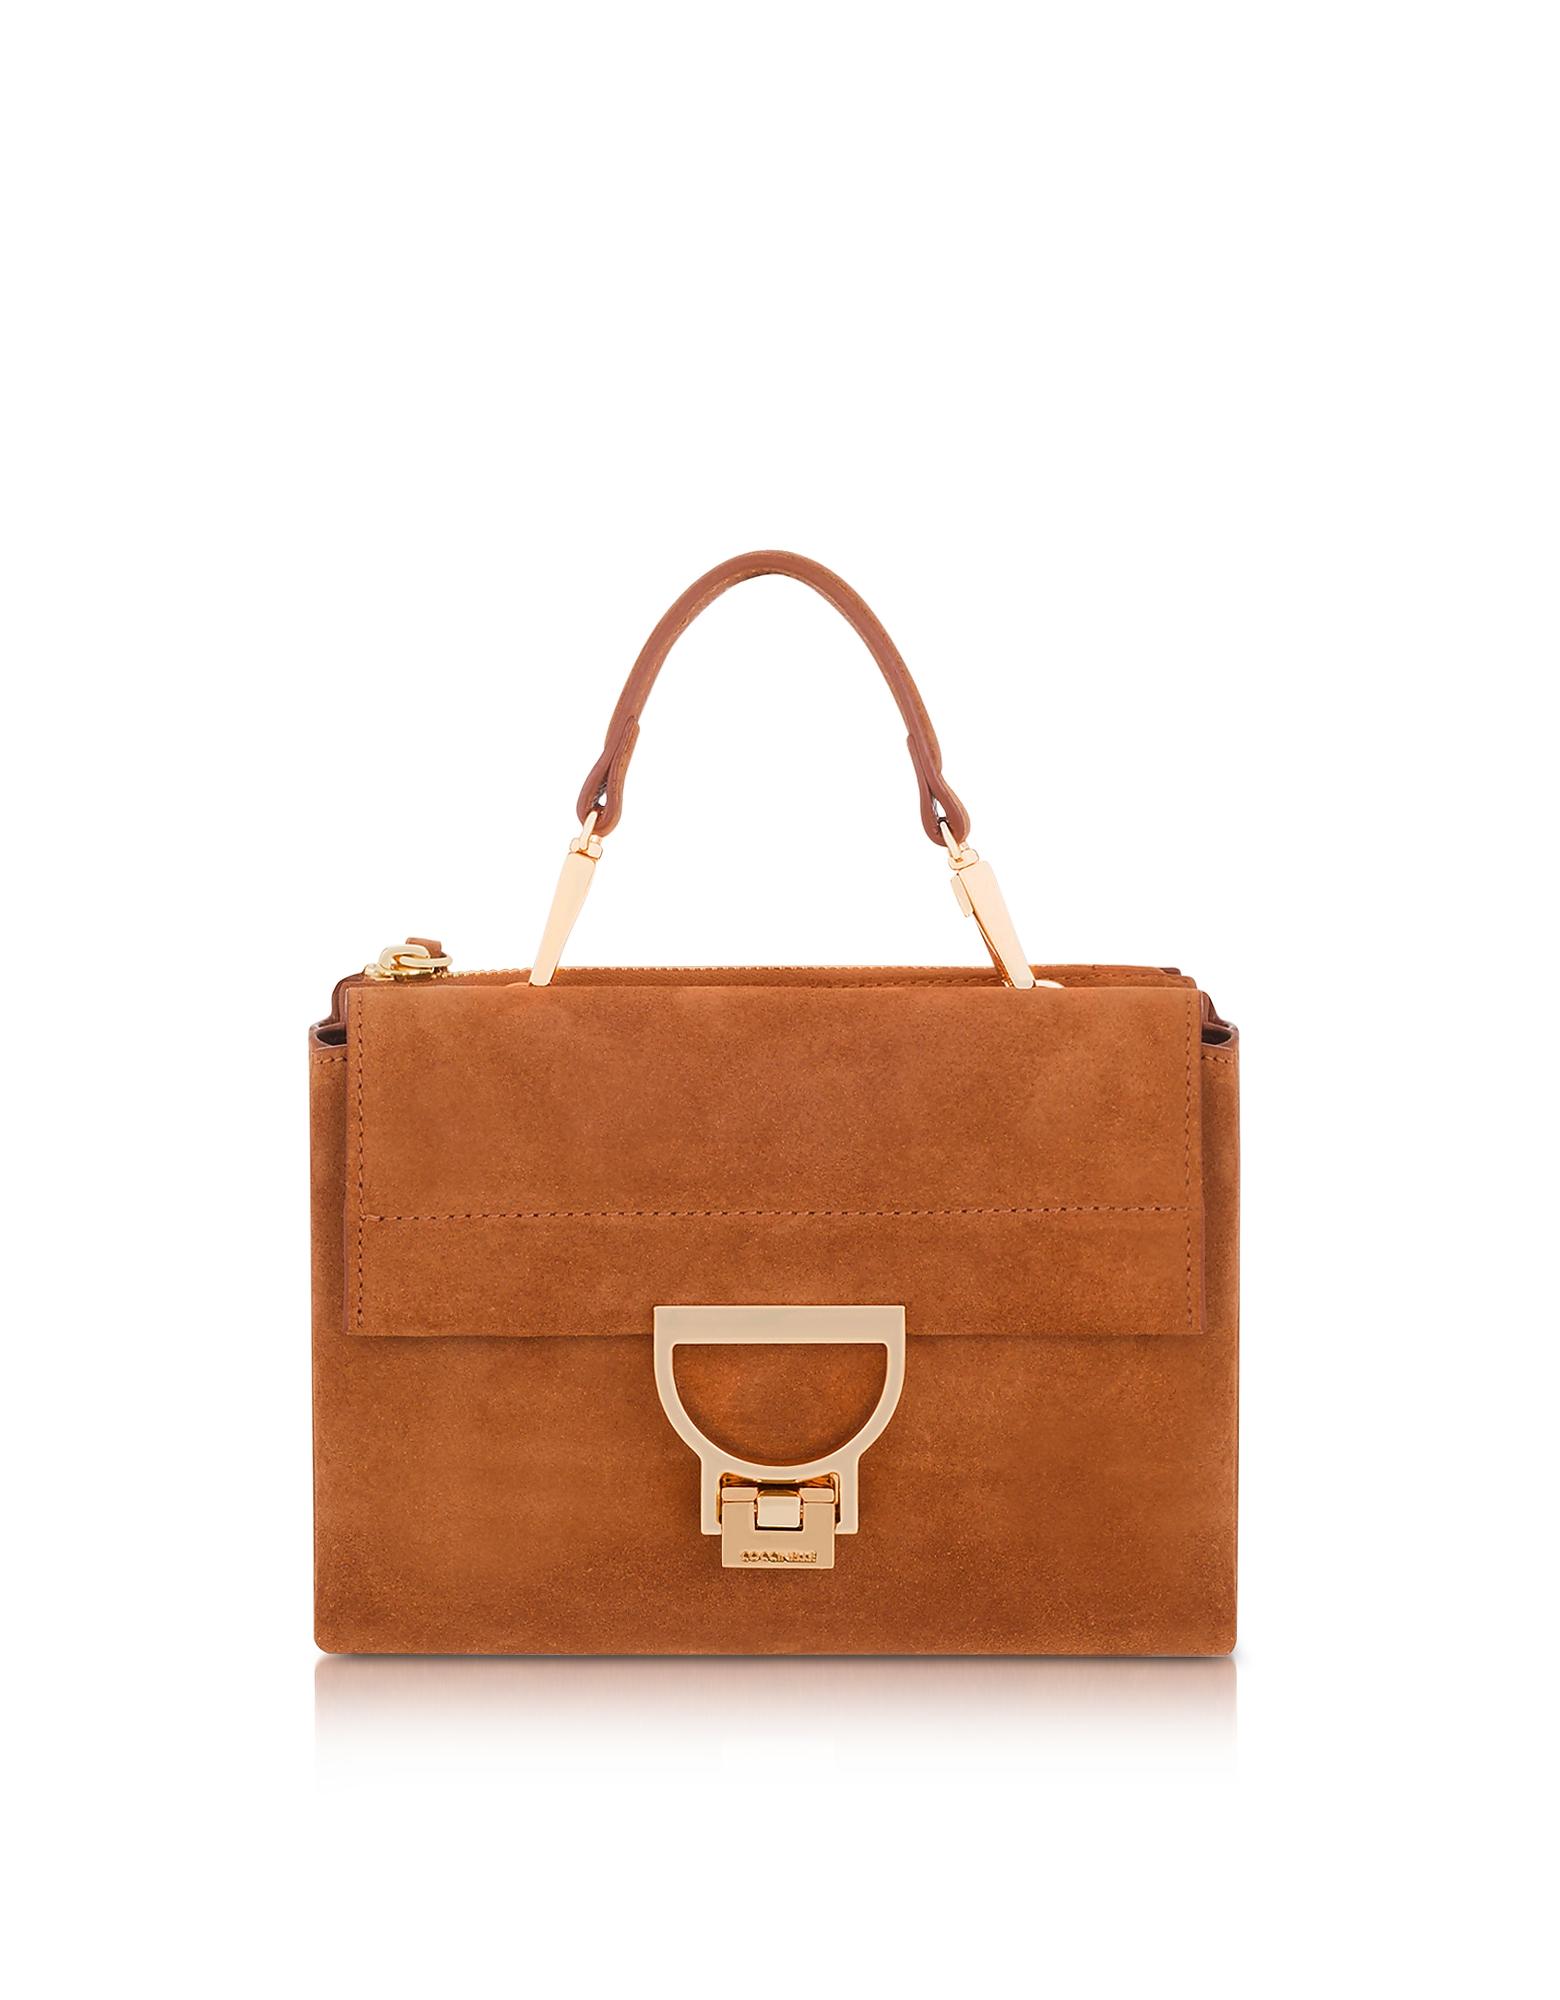 Vintage Handbags, Purses, Bags *New* Coccinelle Designer Handbags Arlettis Suede Top Handle Crossbody Bag $226.80 AT vintagedancer.com